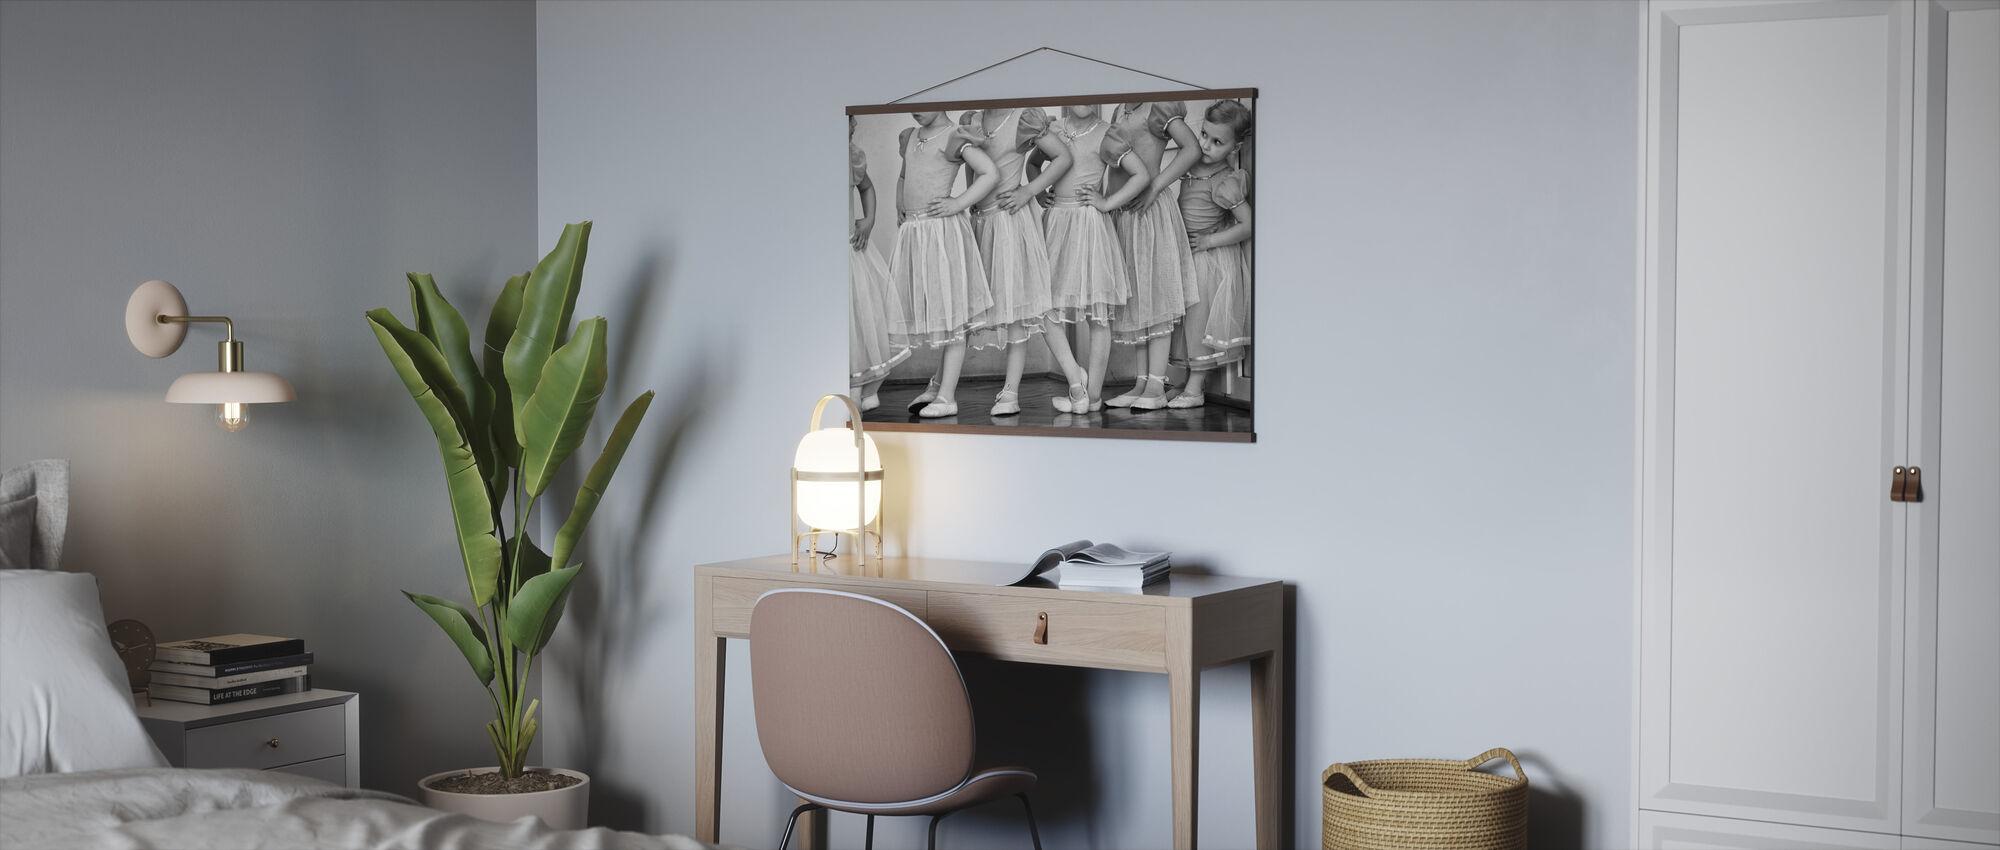 Ballerina - Plakat - Kontor